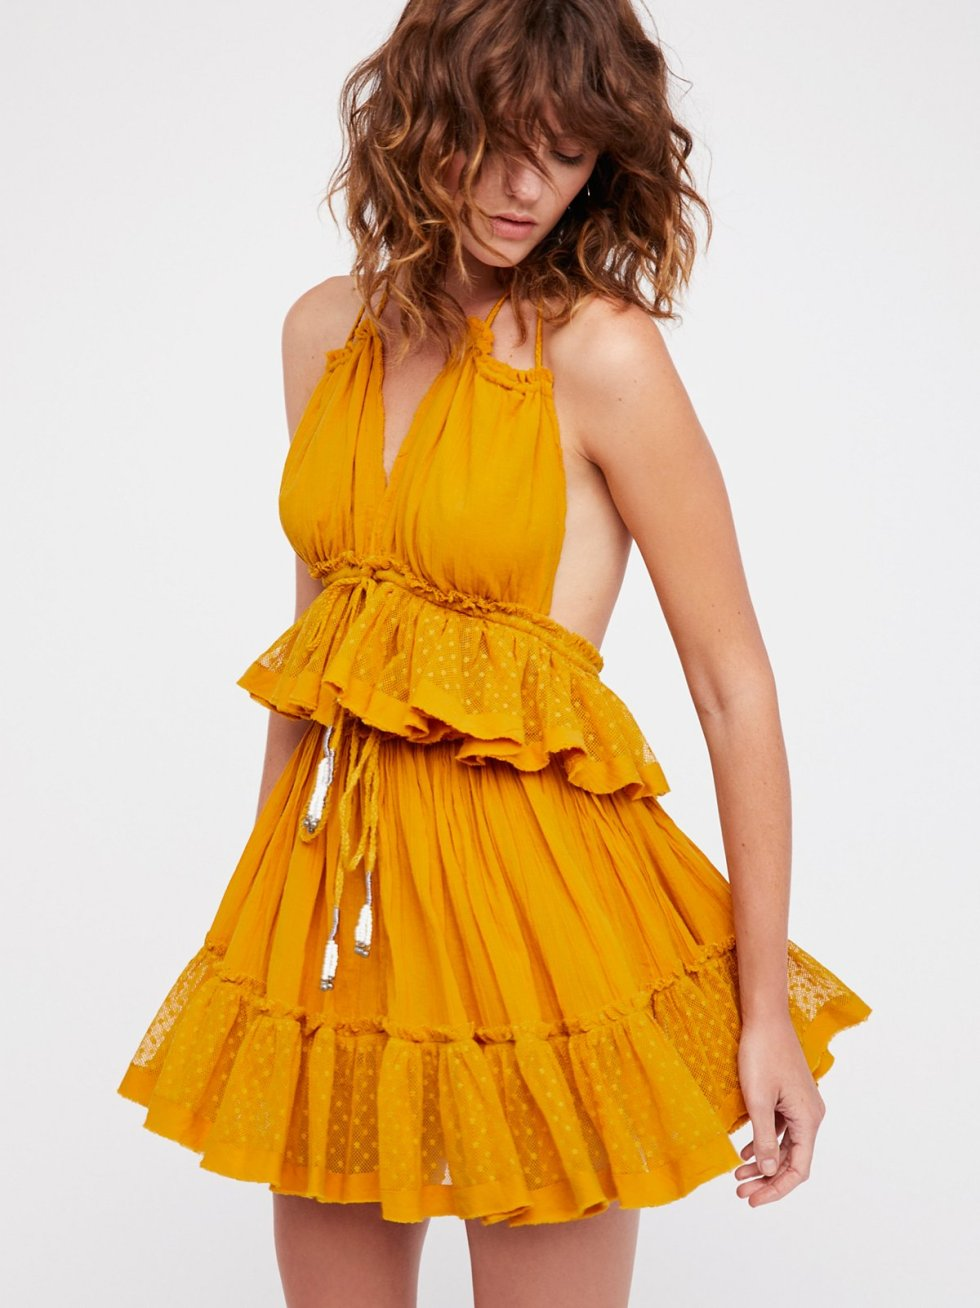 fashion, halter top halter neckline date night what to wear style guide